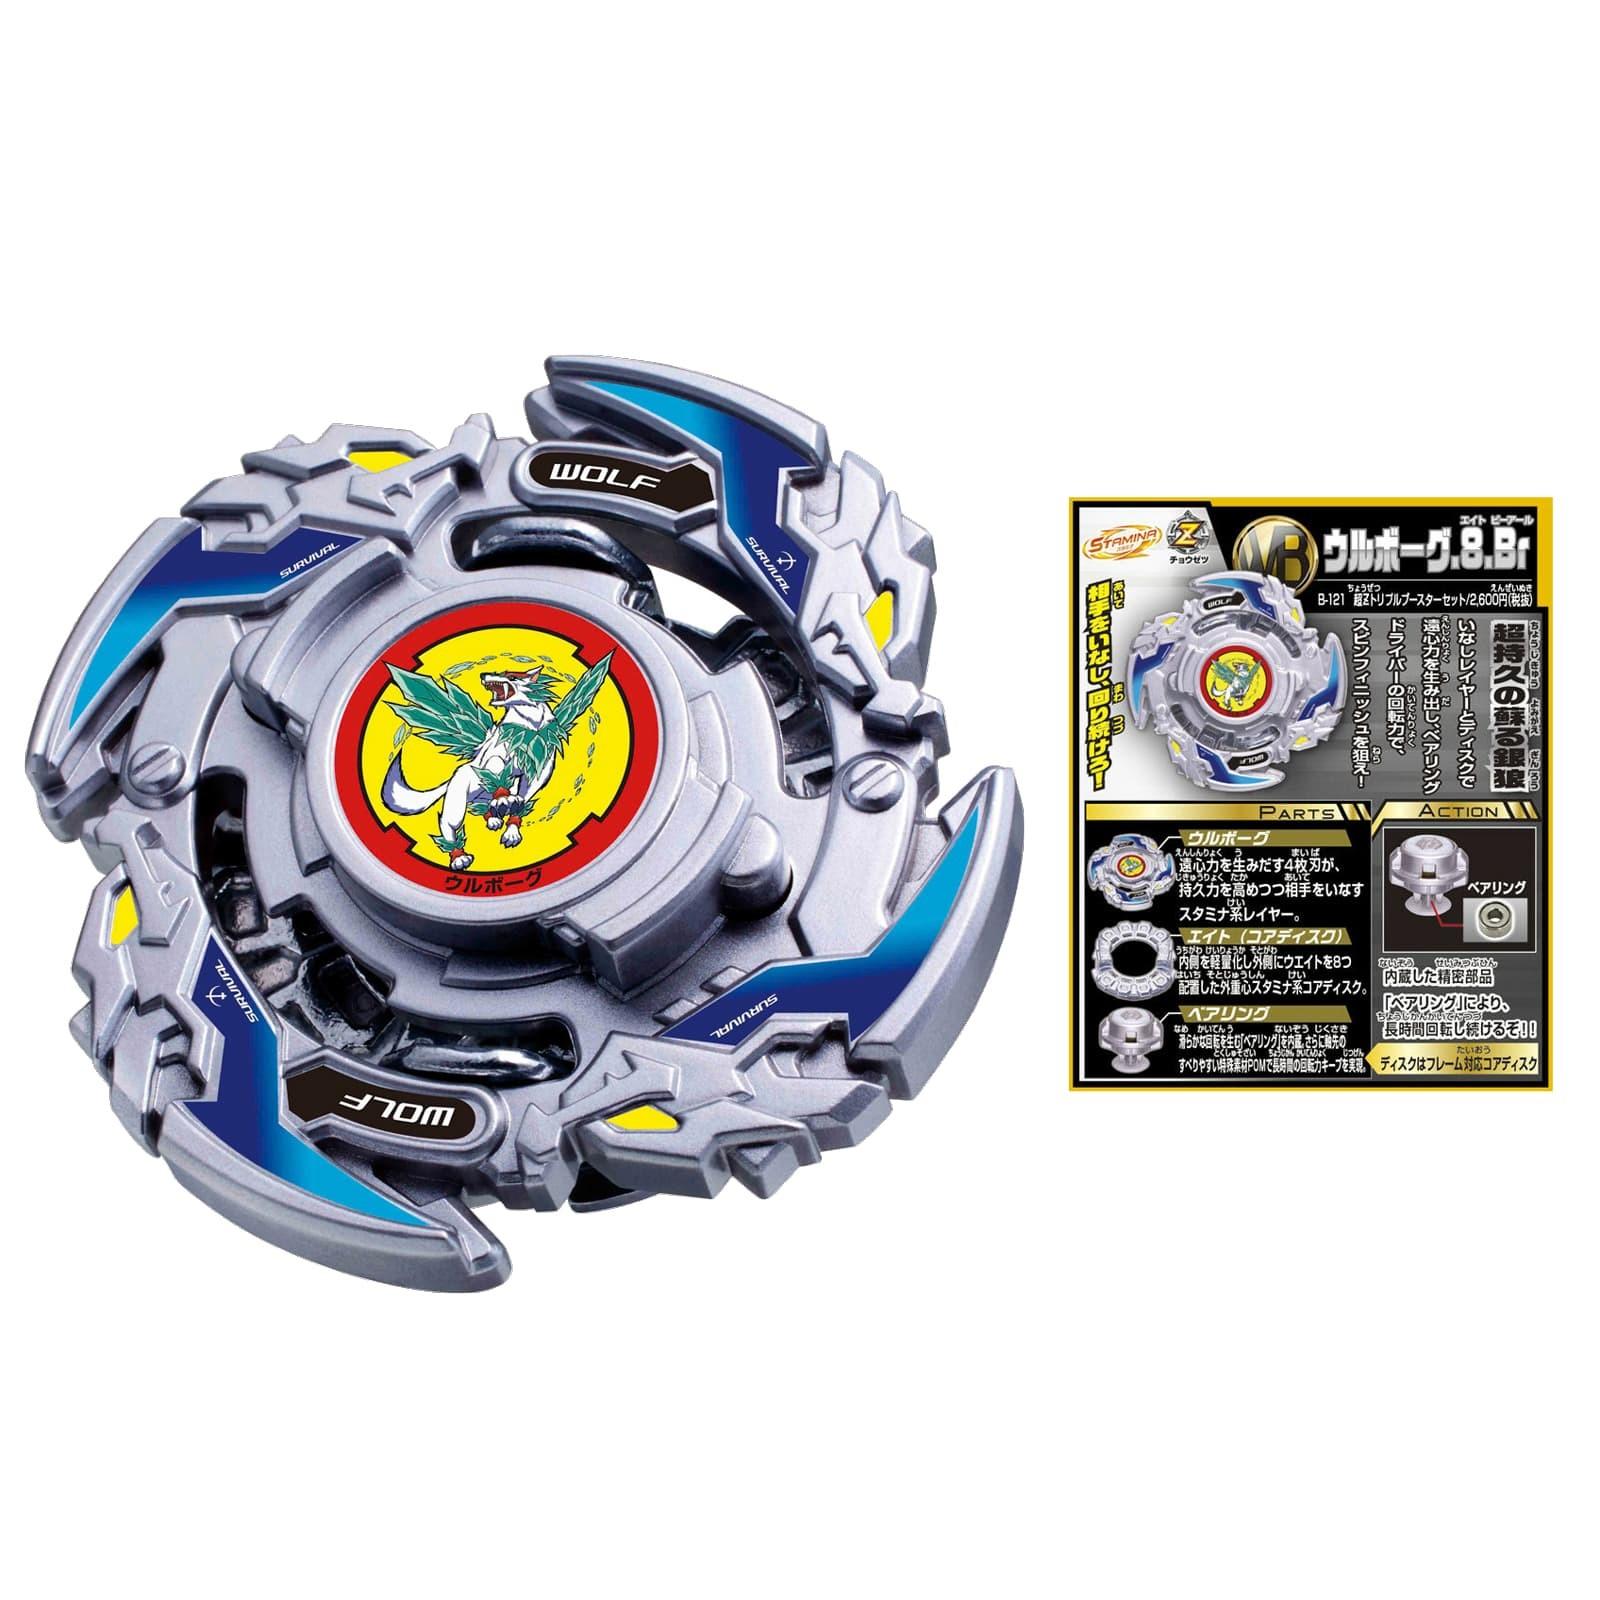 Набор из 3-х Волчков BEYBLADE Burst «Cho-Z Triple Booster Set» B-121 с Хазард Кербеусом от Takara Tomy